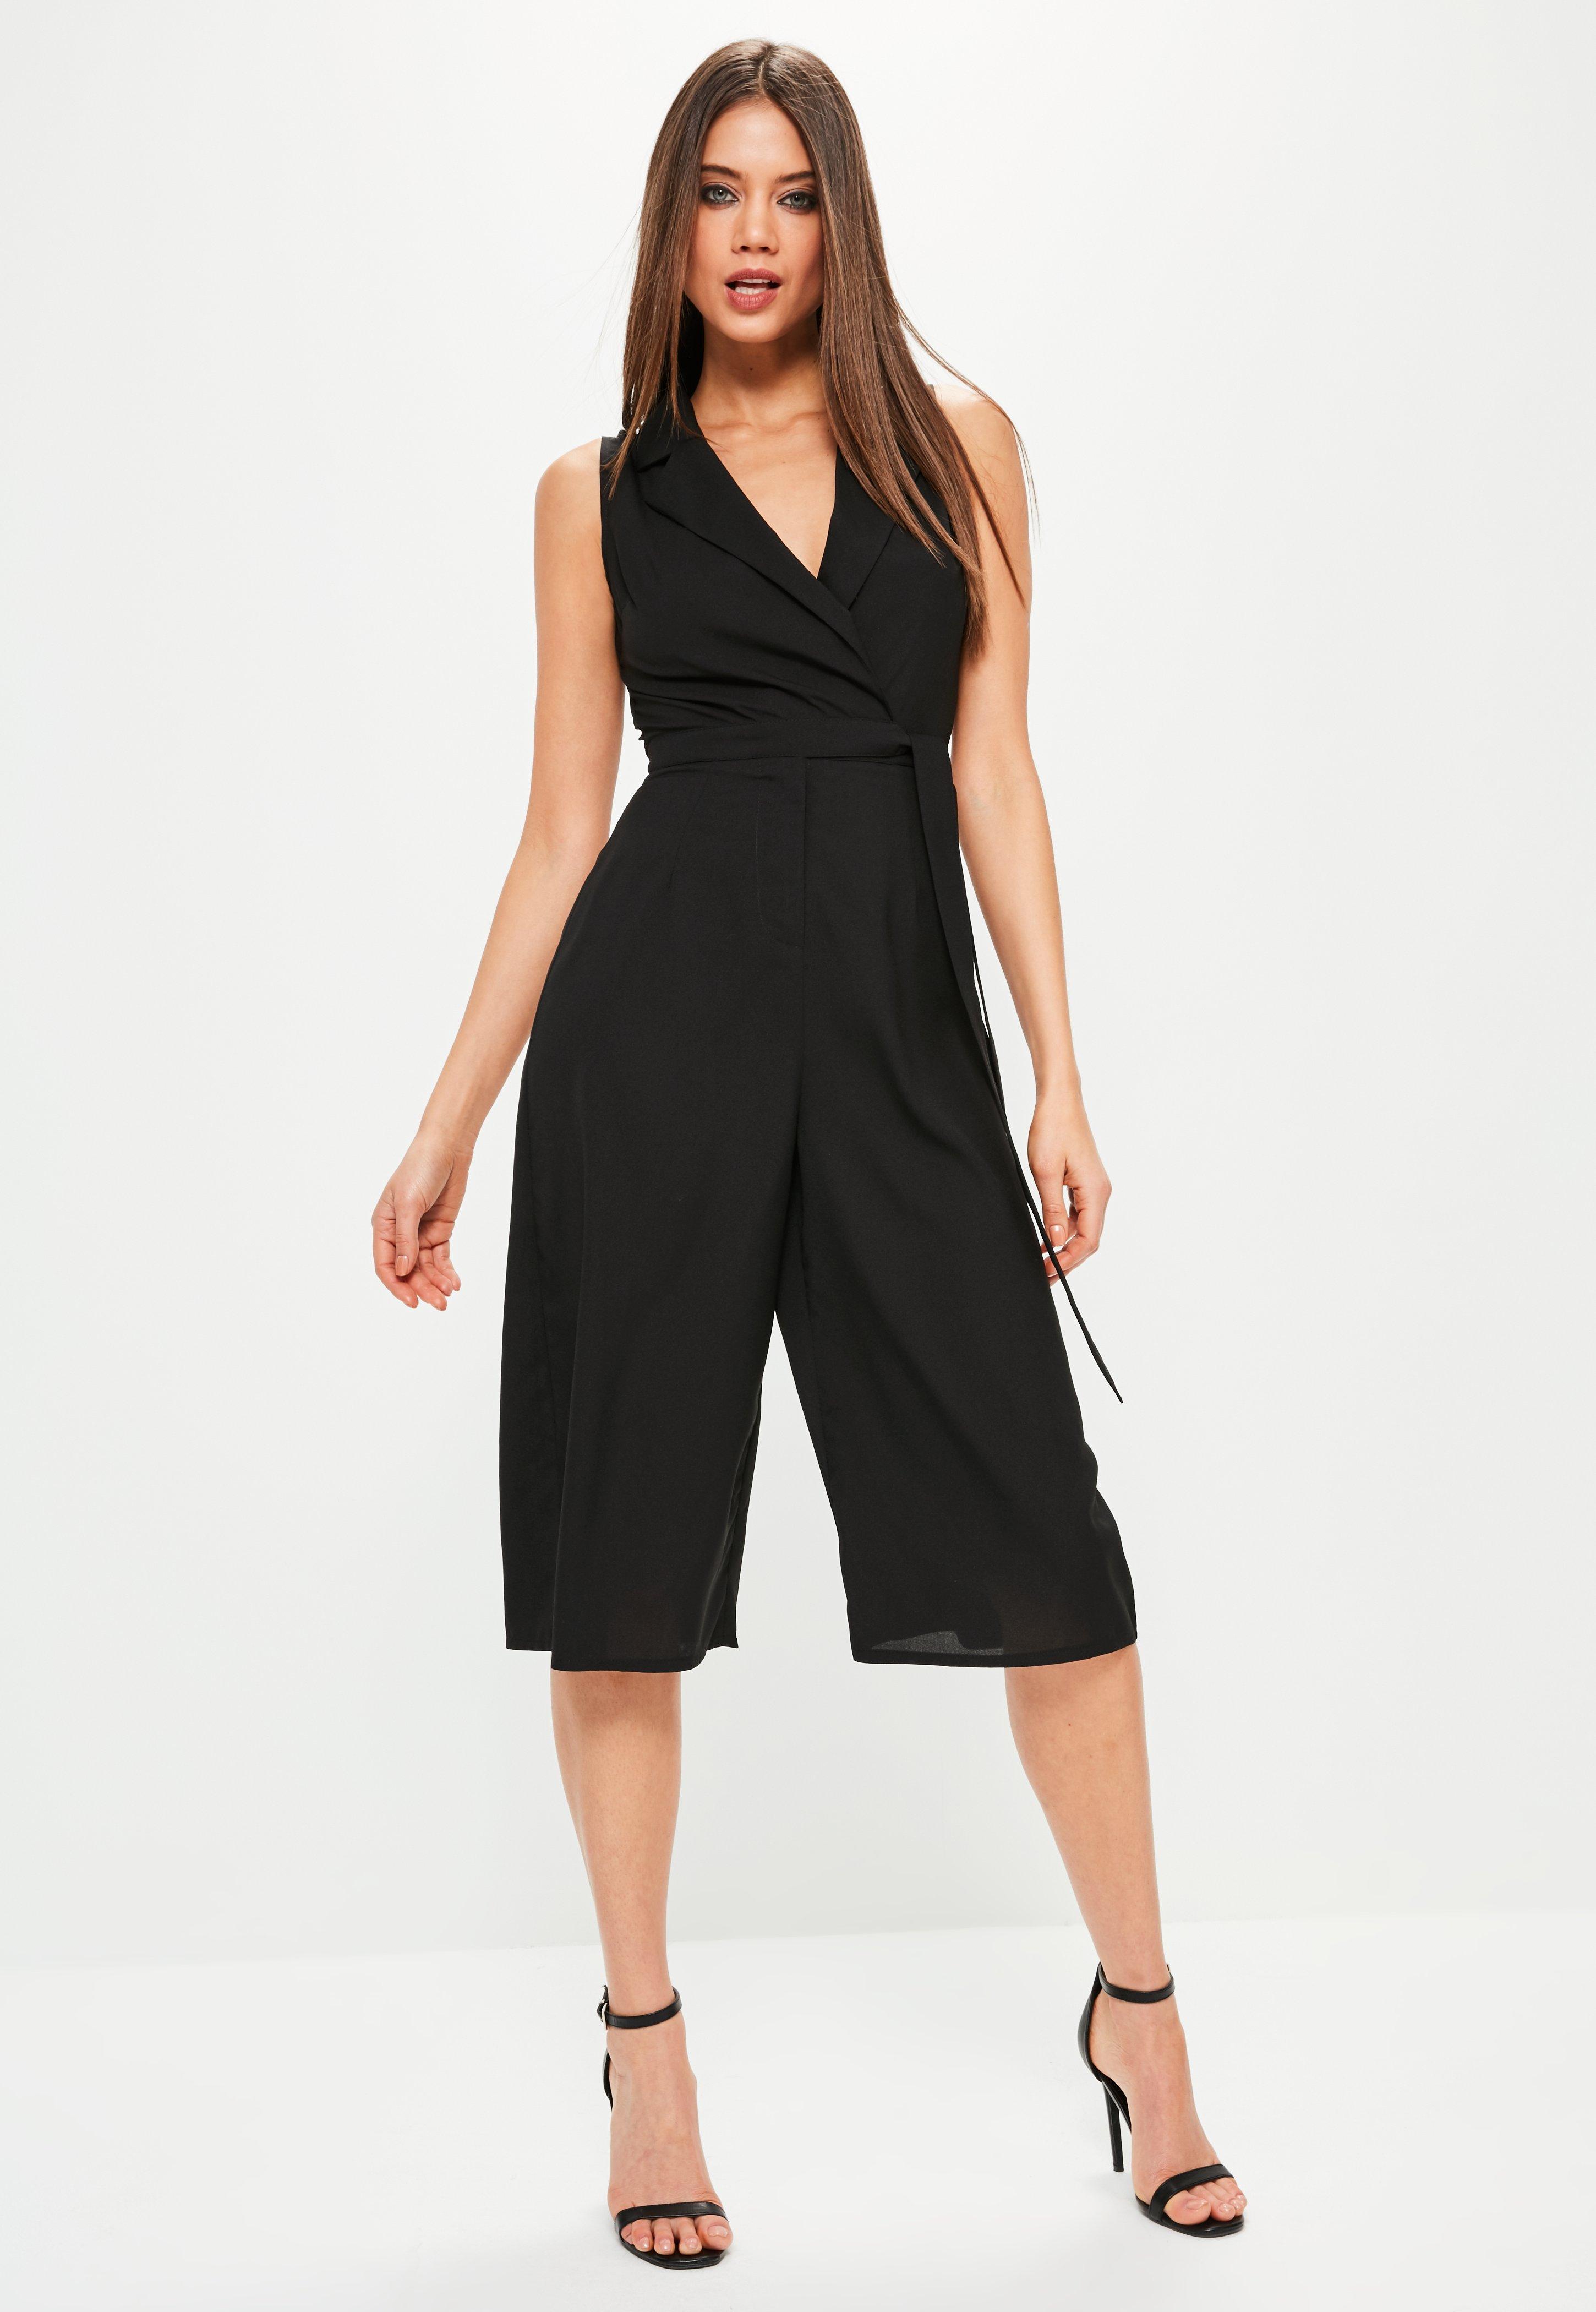 97716d30e846 Missguided Petite Black Tuxedo Sleeveless Wrap Jumpsuit in Black - Lyst